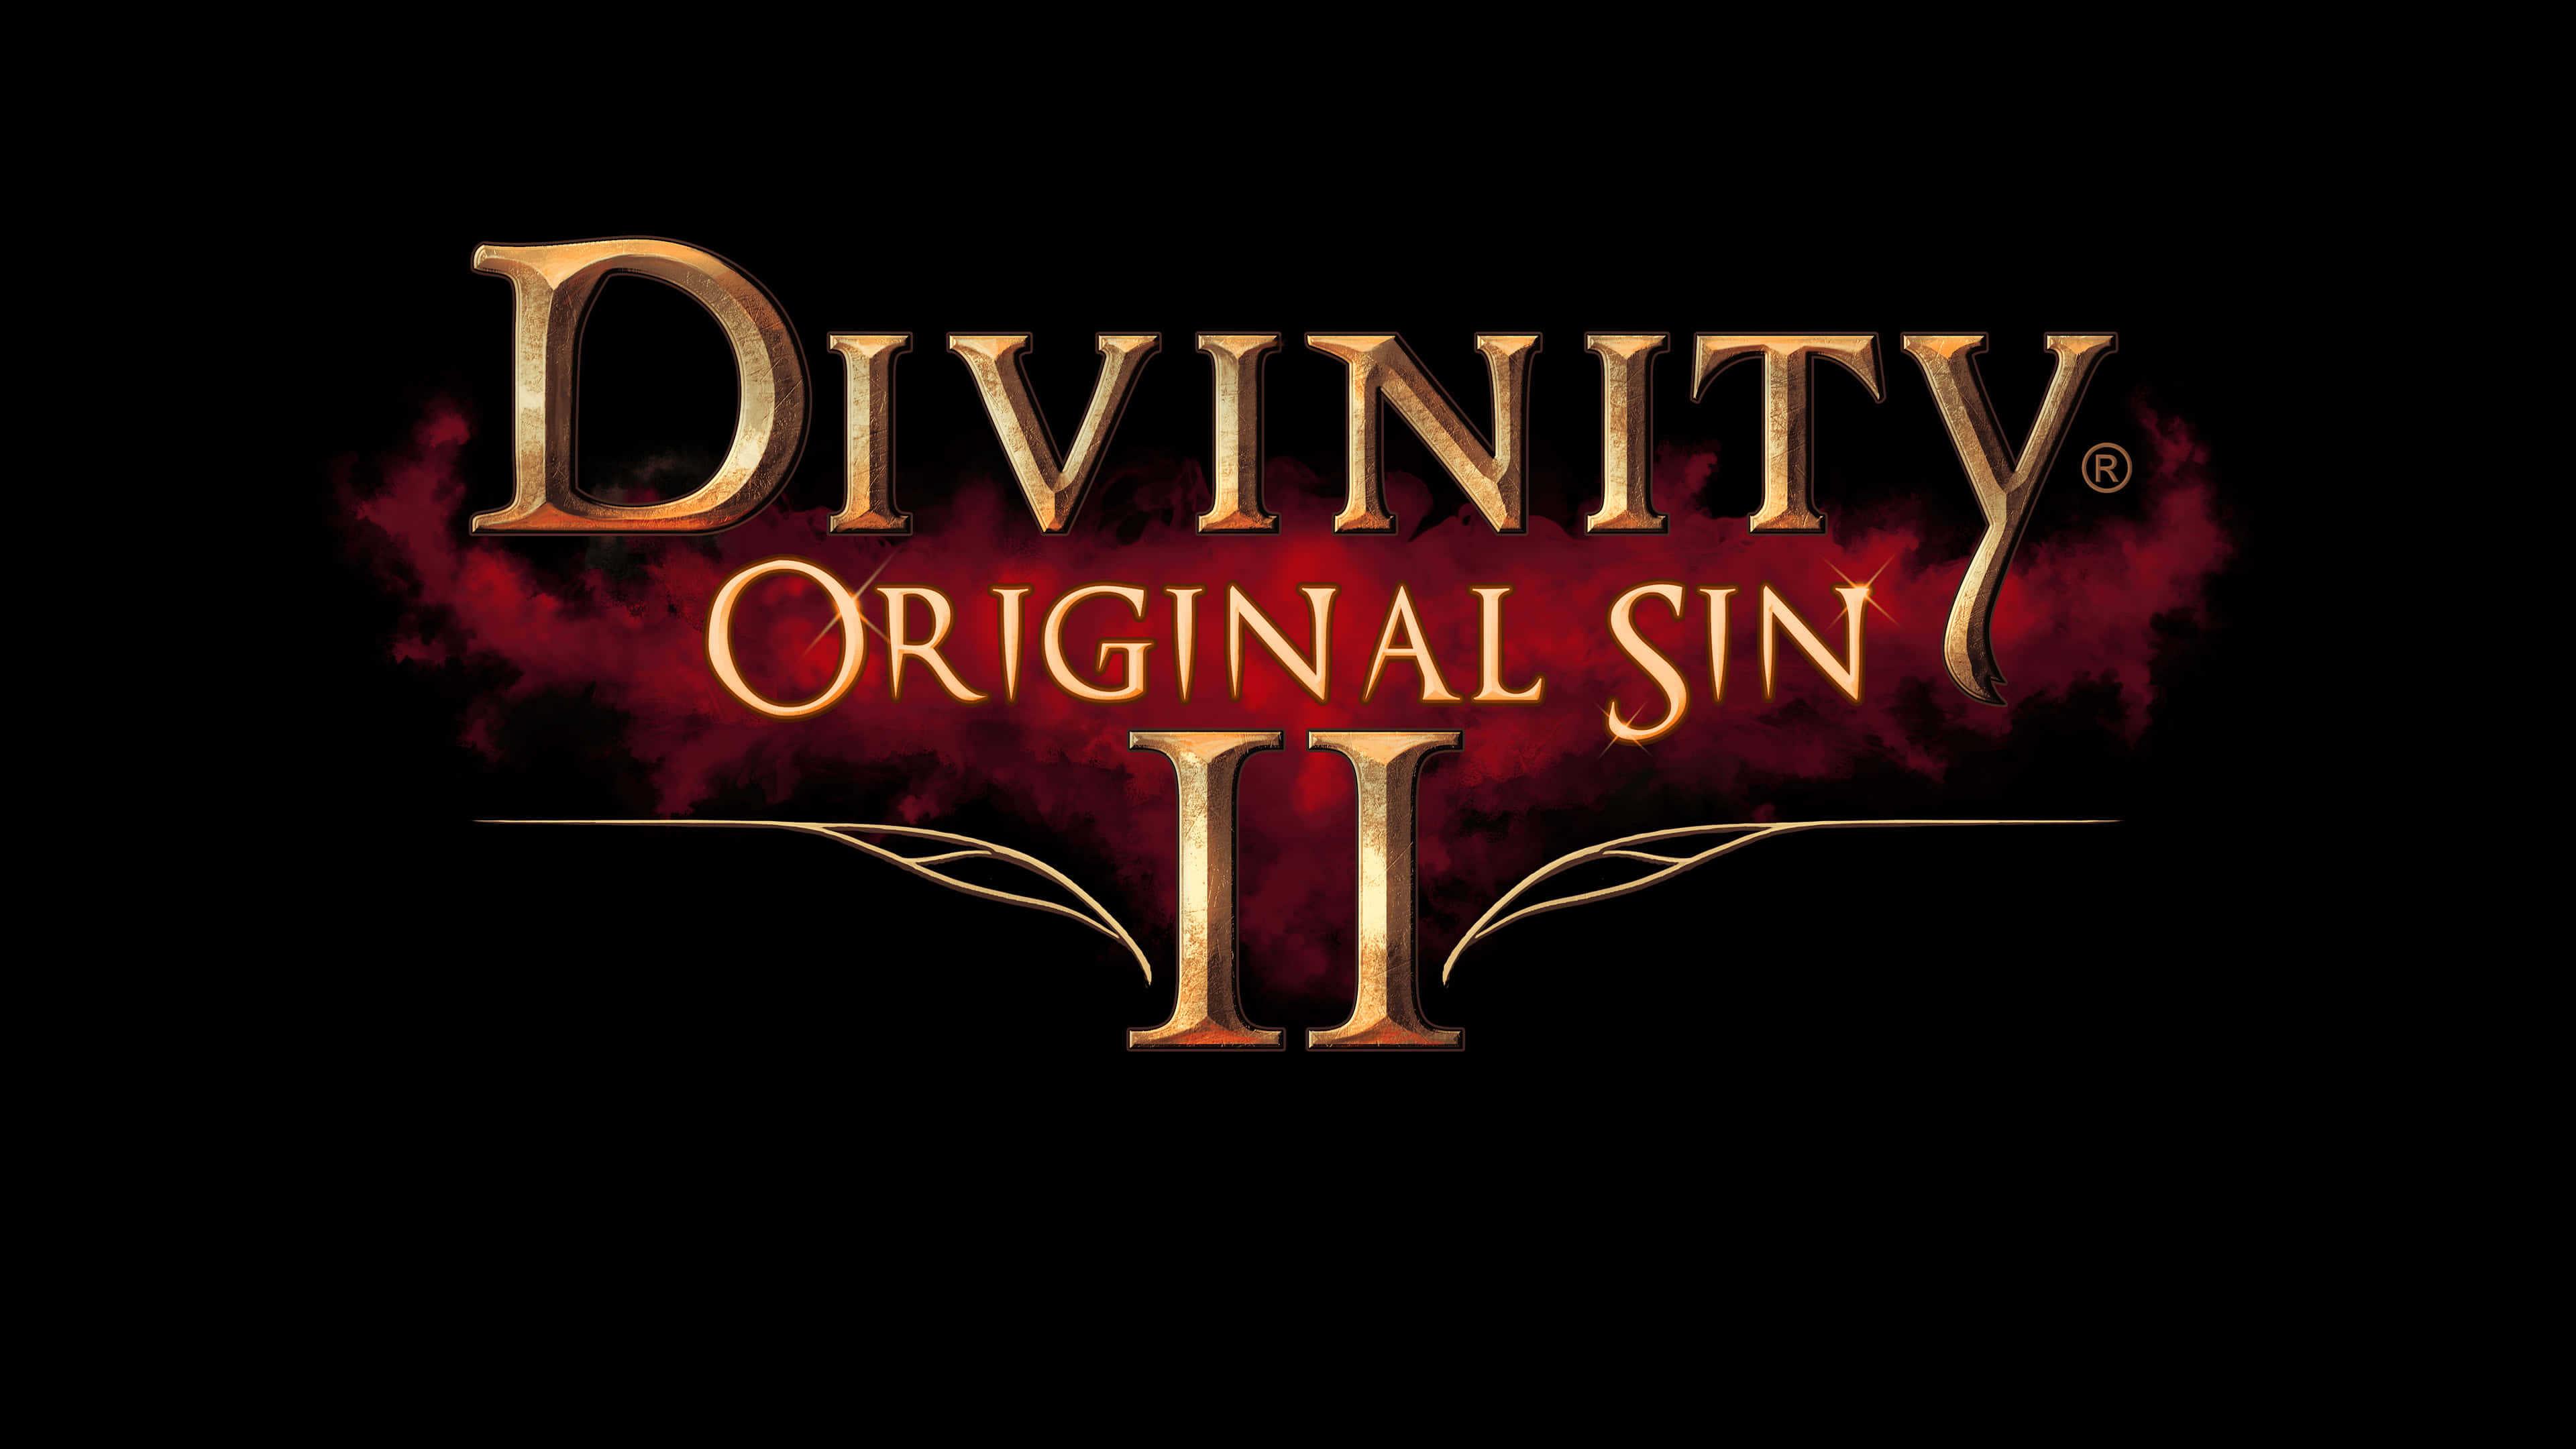 Divinity Original Sin 2 Uhd 4k Wallpaper Pixelz